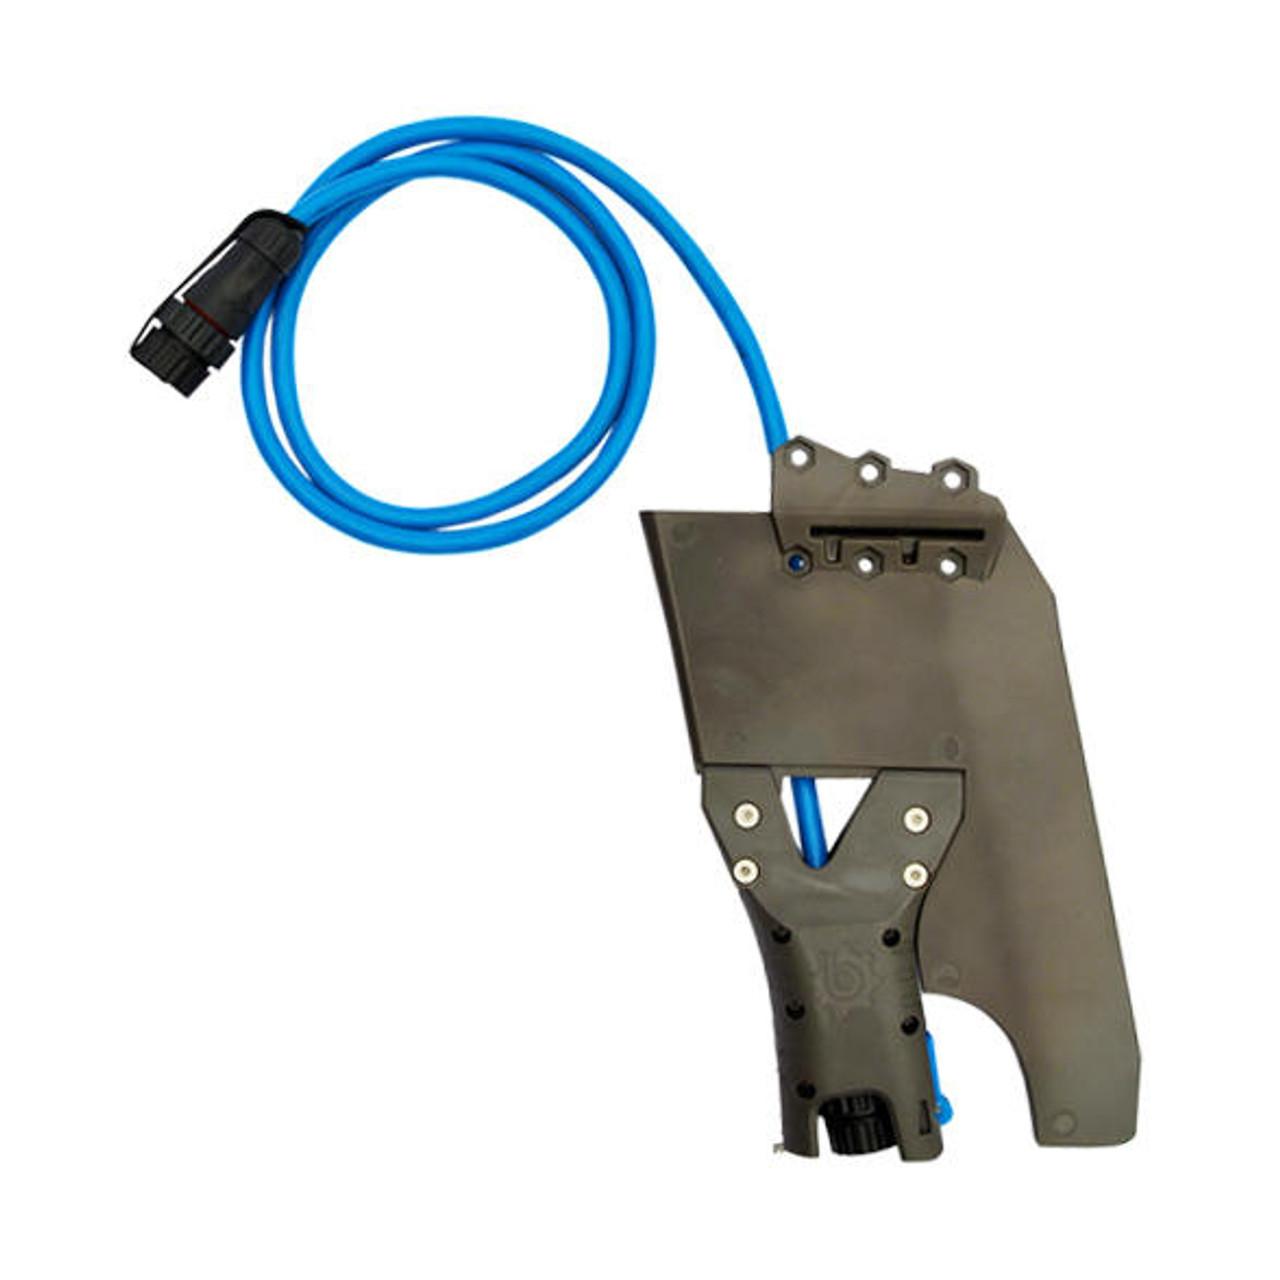 Bixpy Hobie Twist and Stow Rudder AdapterJ-1 Motors